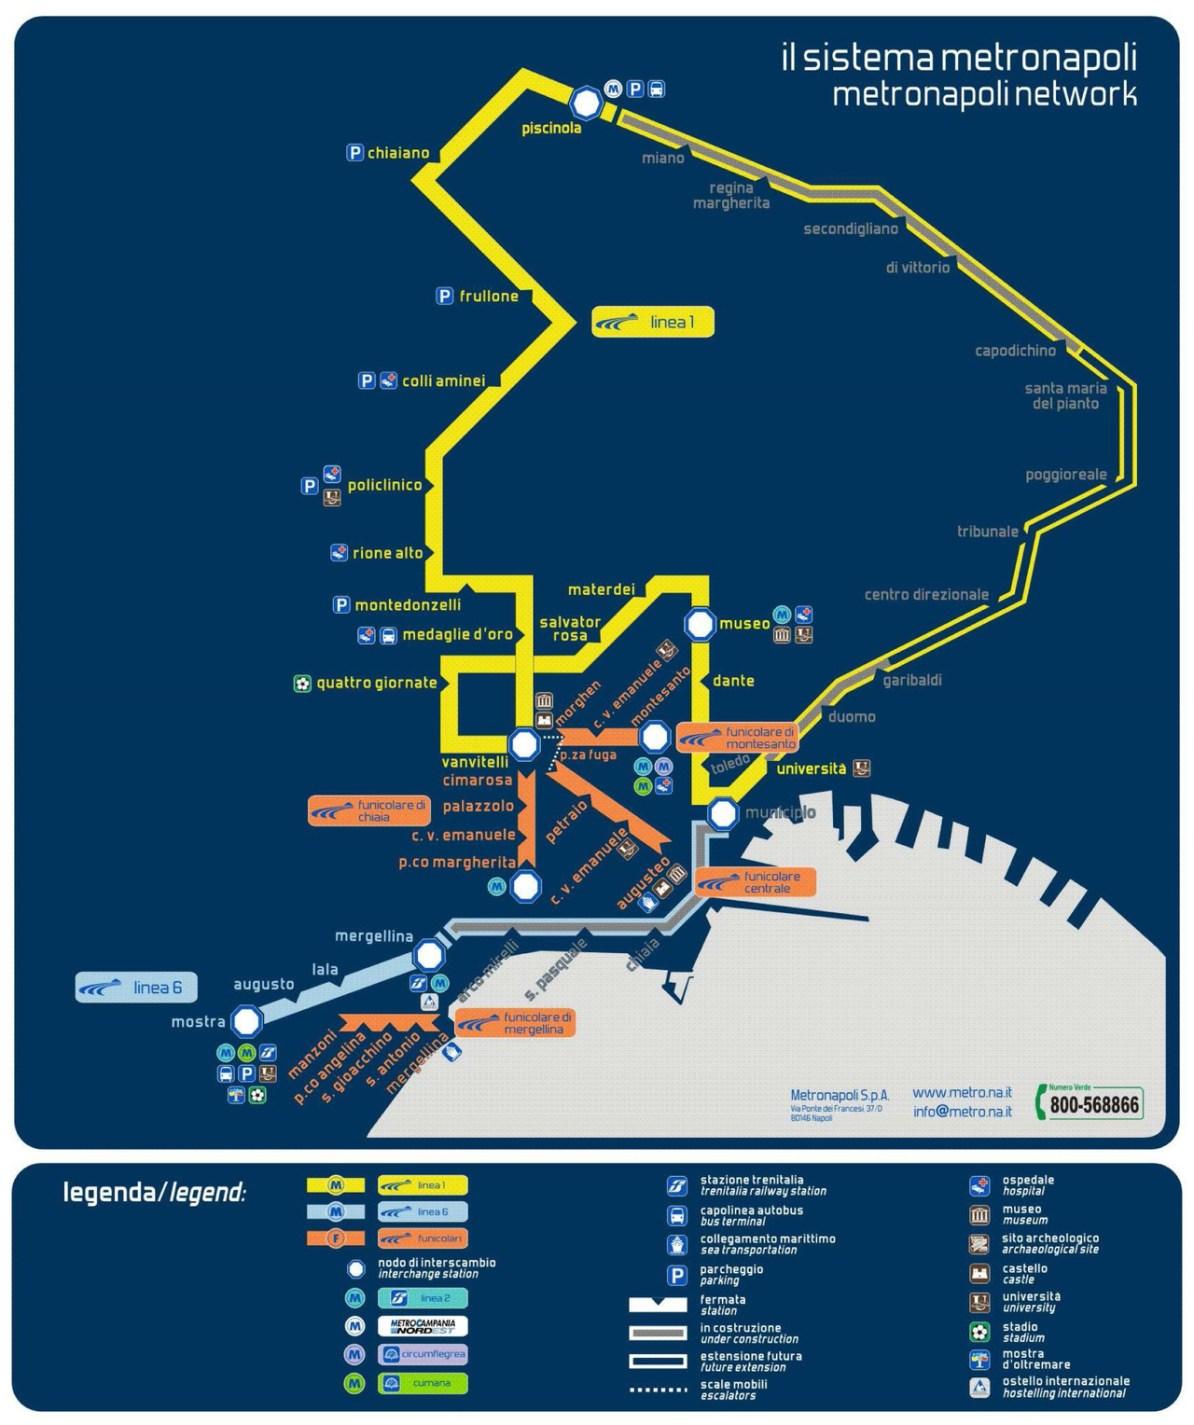 Naples Subway Map.Transit Maps Official Map Metropolitana Di Napoli 2012 1 Of 2